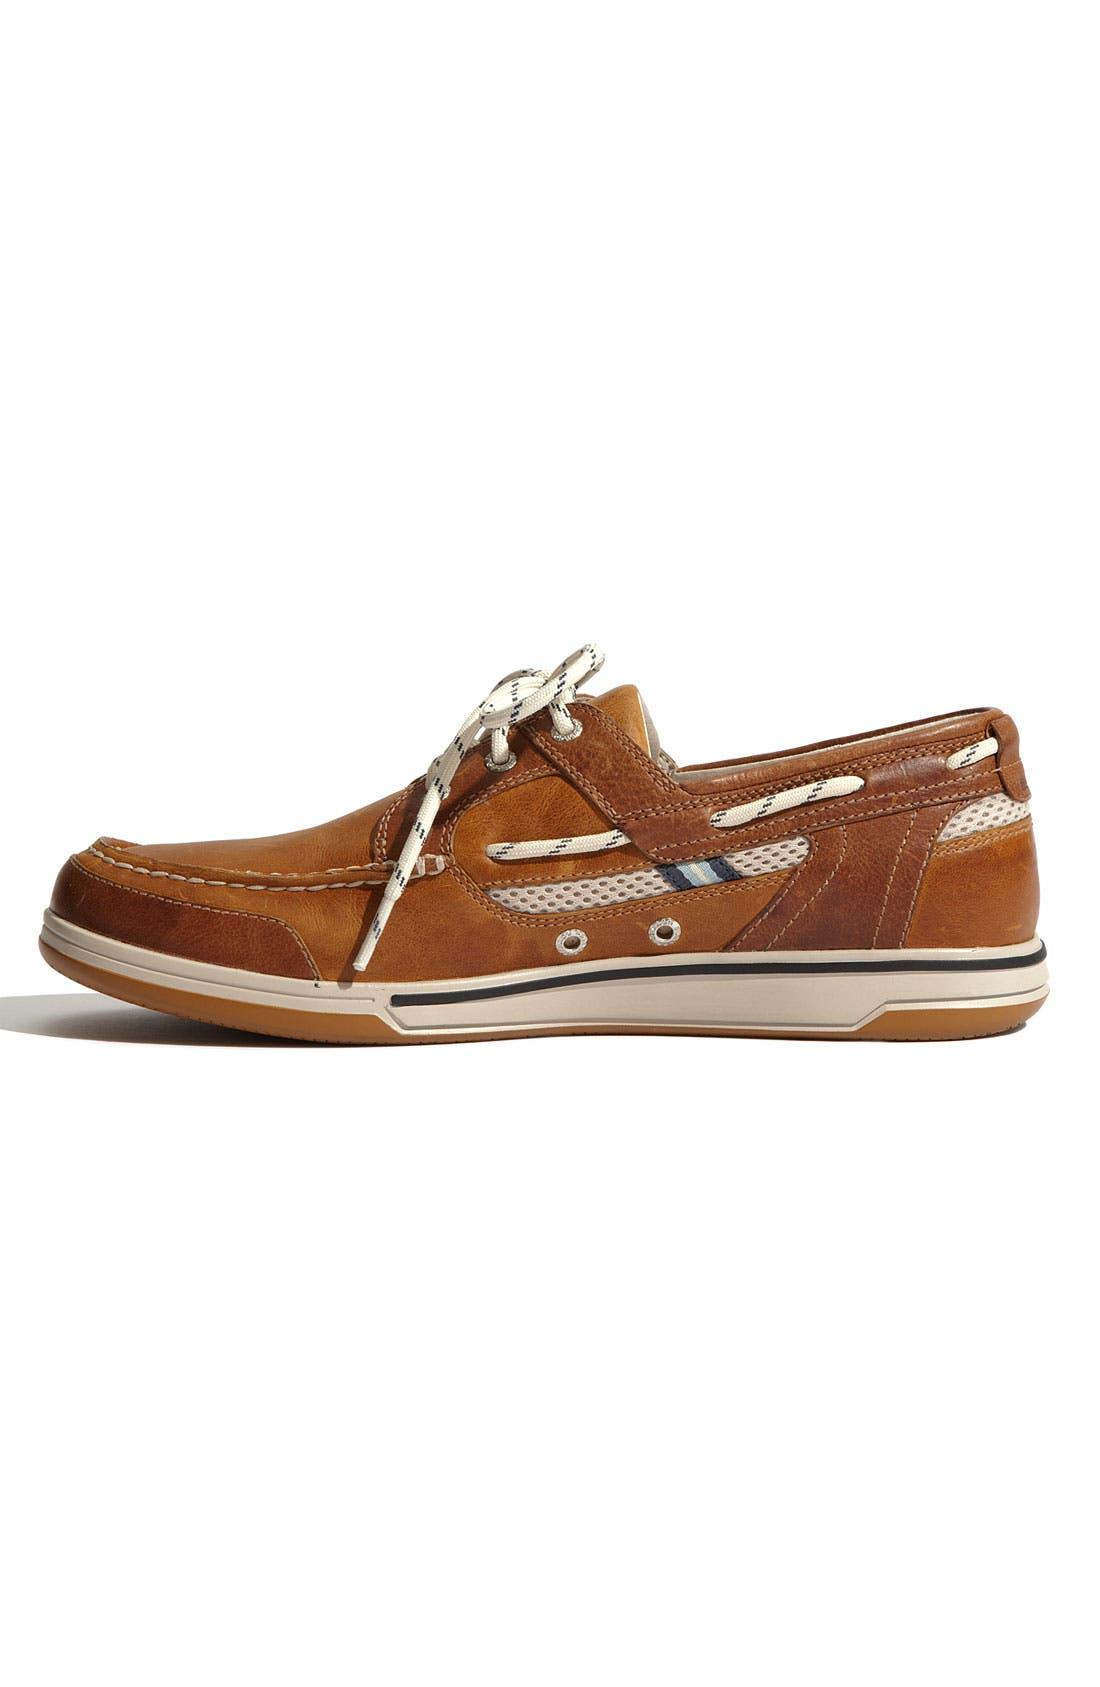 Alternate Image 2  - Sebago 'Triton' Boat Shoe